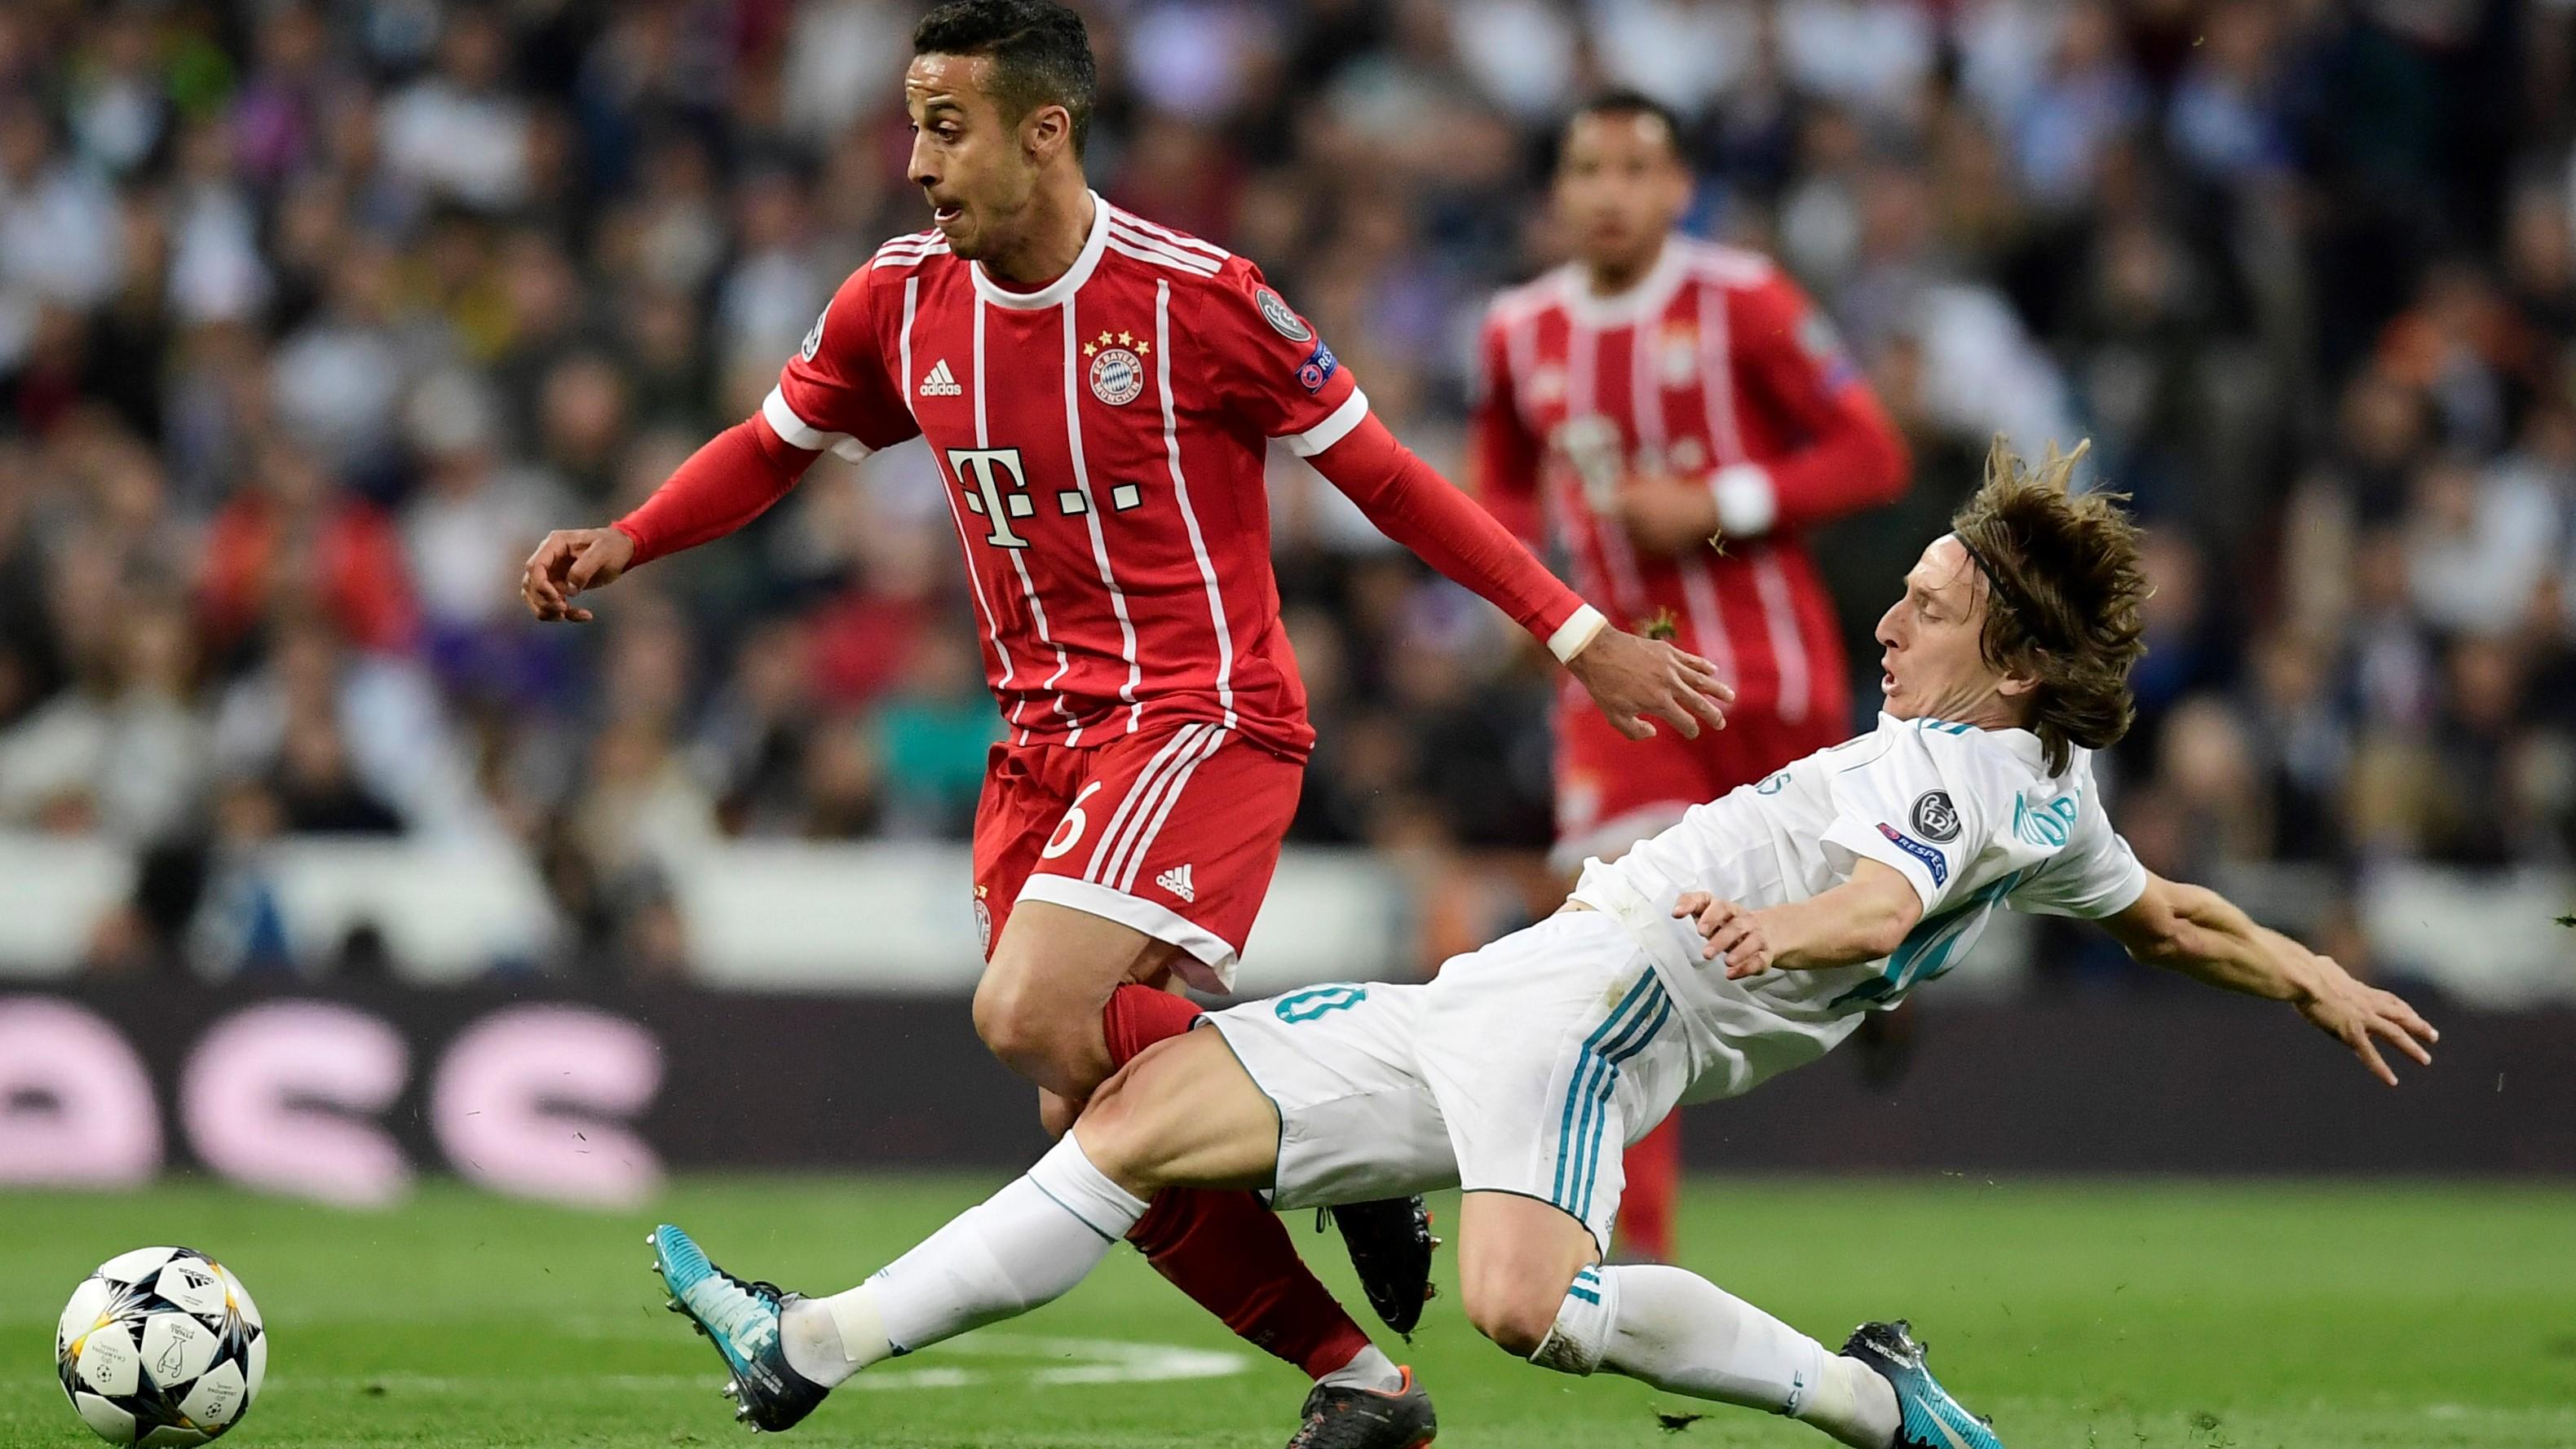 Thiago Alcantara Luka Modric Real Madrid Bayern Munich UCL 01052018